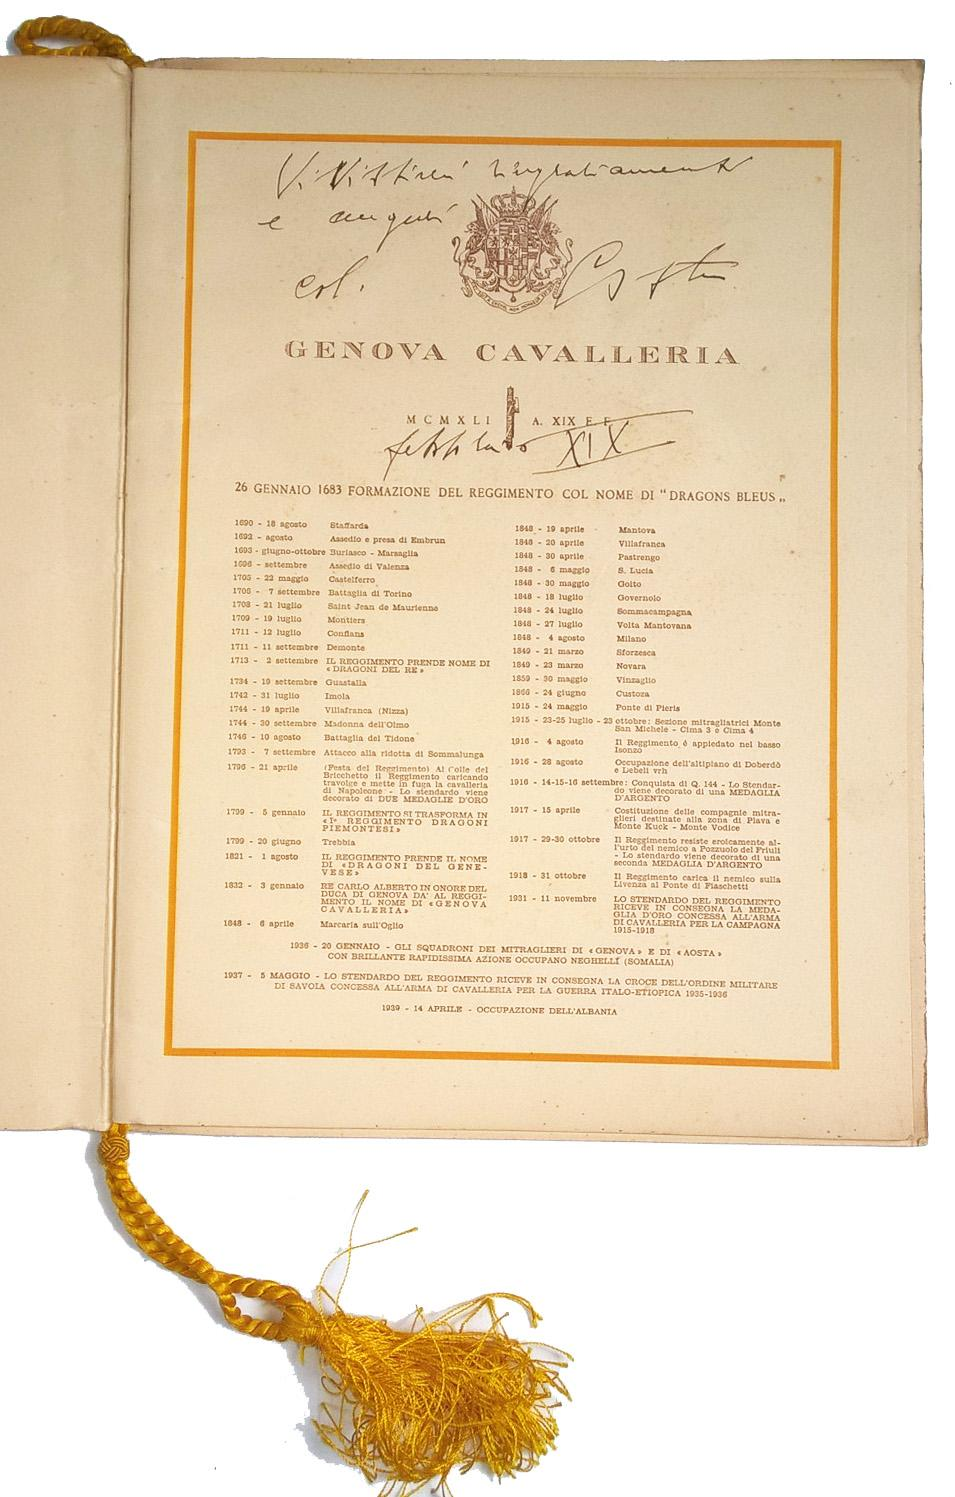 Calendario 1936.Calendario Militare Reggimento Genova